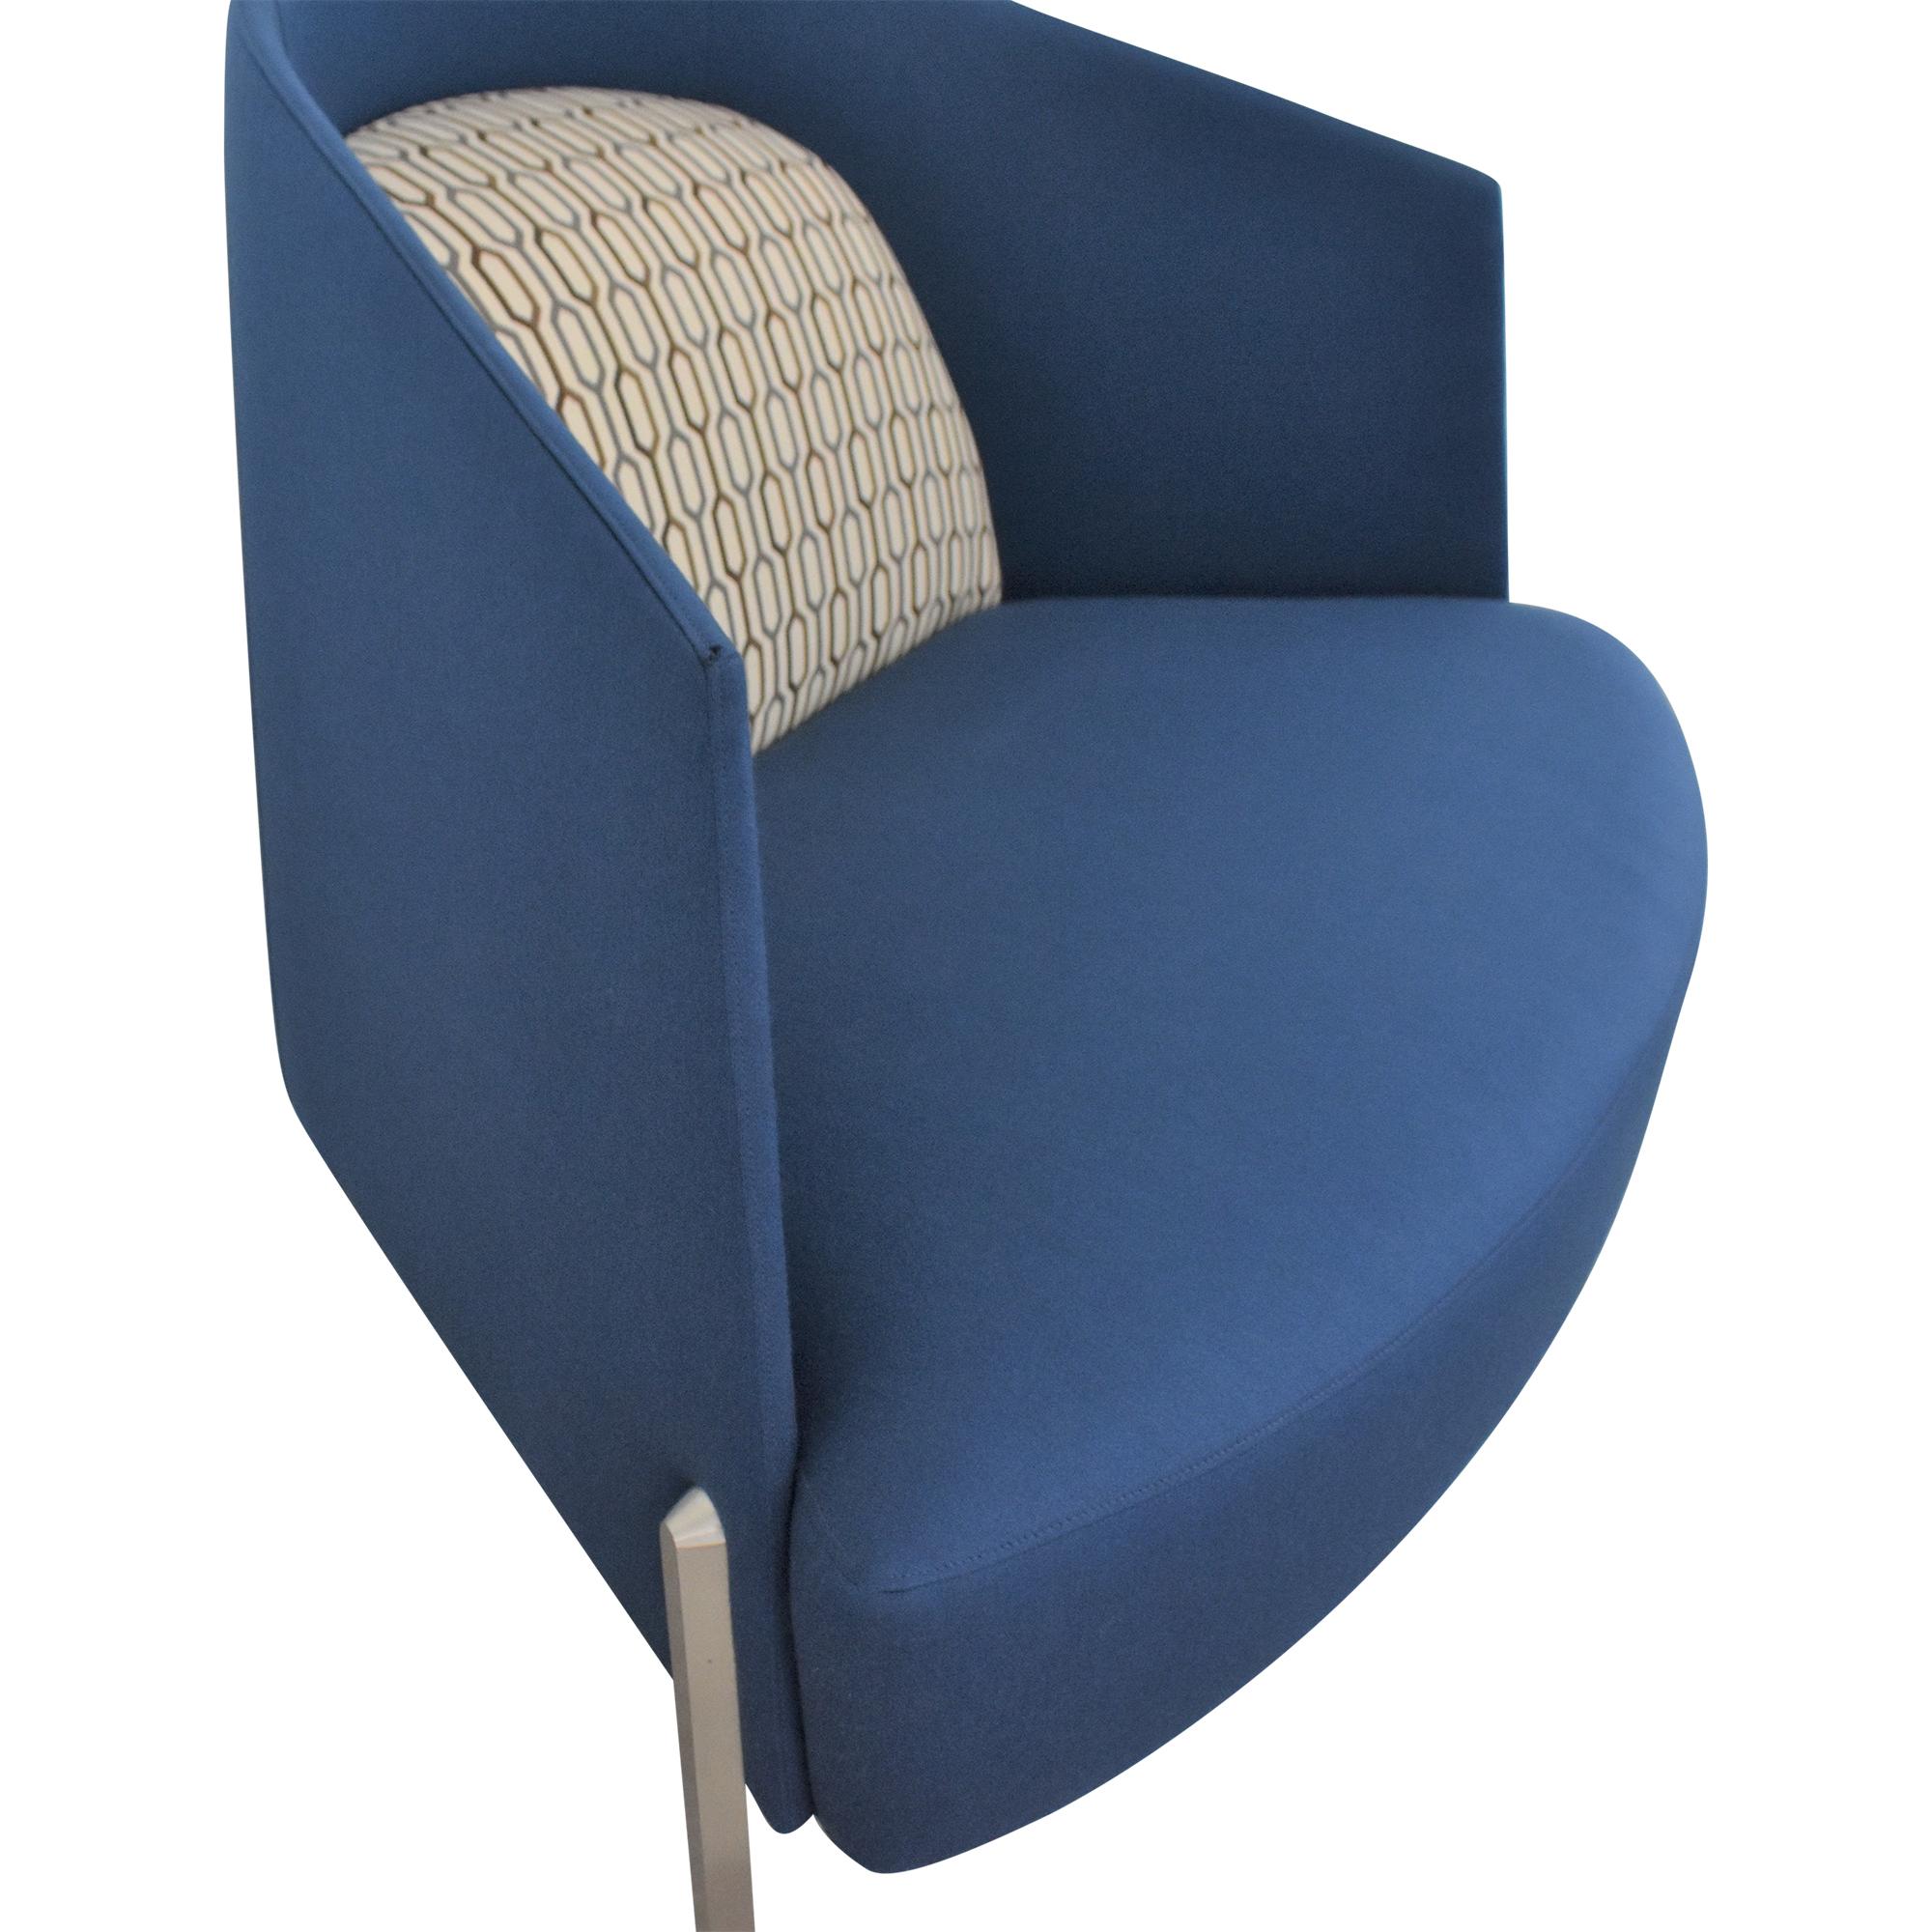 buy TK Collections Studio TK Fractals Lounge Chair online